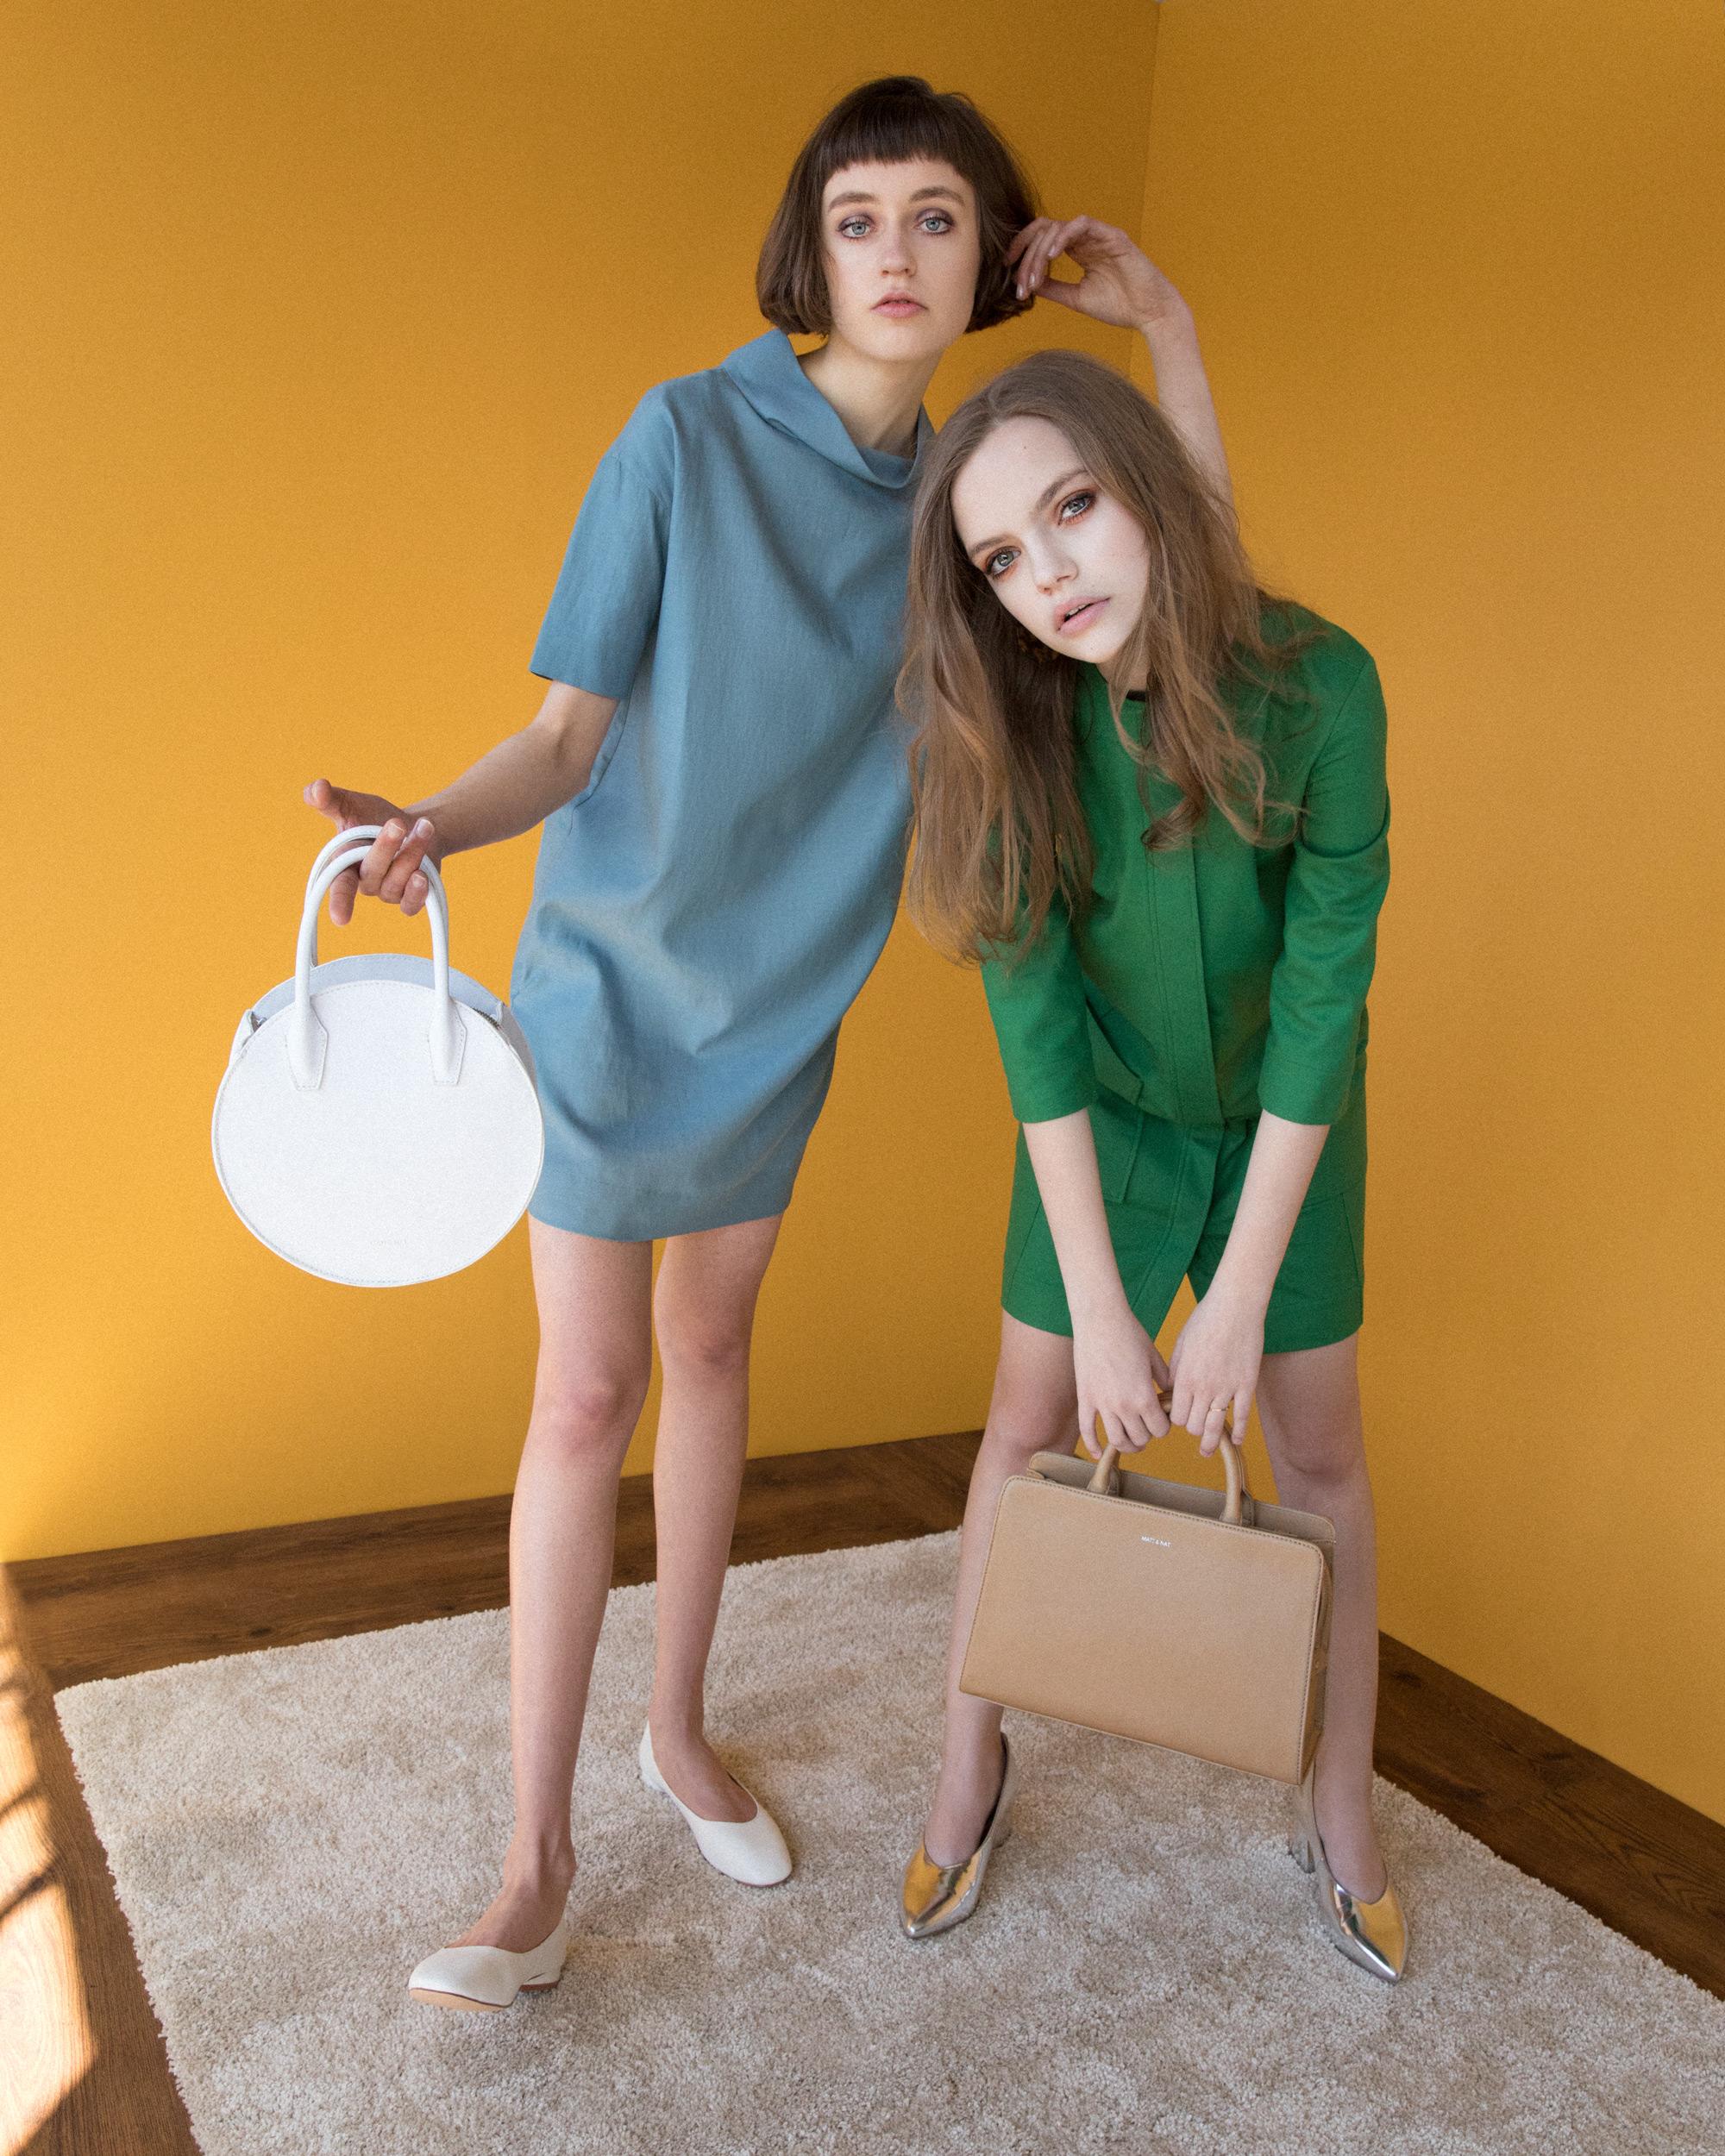 Indigo Books & Music: Up to 46% OFF on Select Matt & Nat Handbags